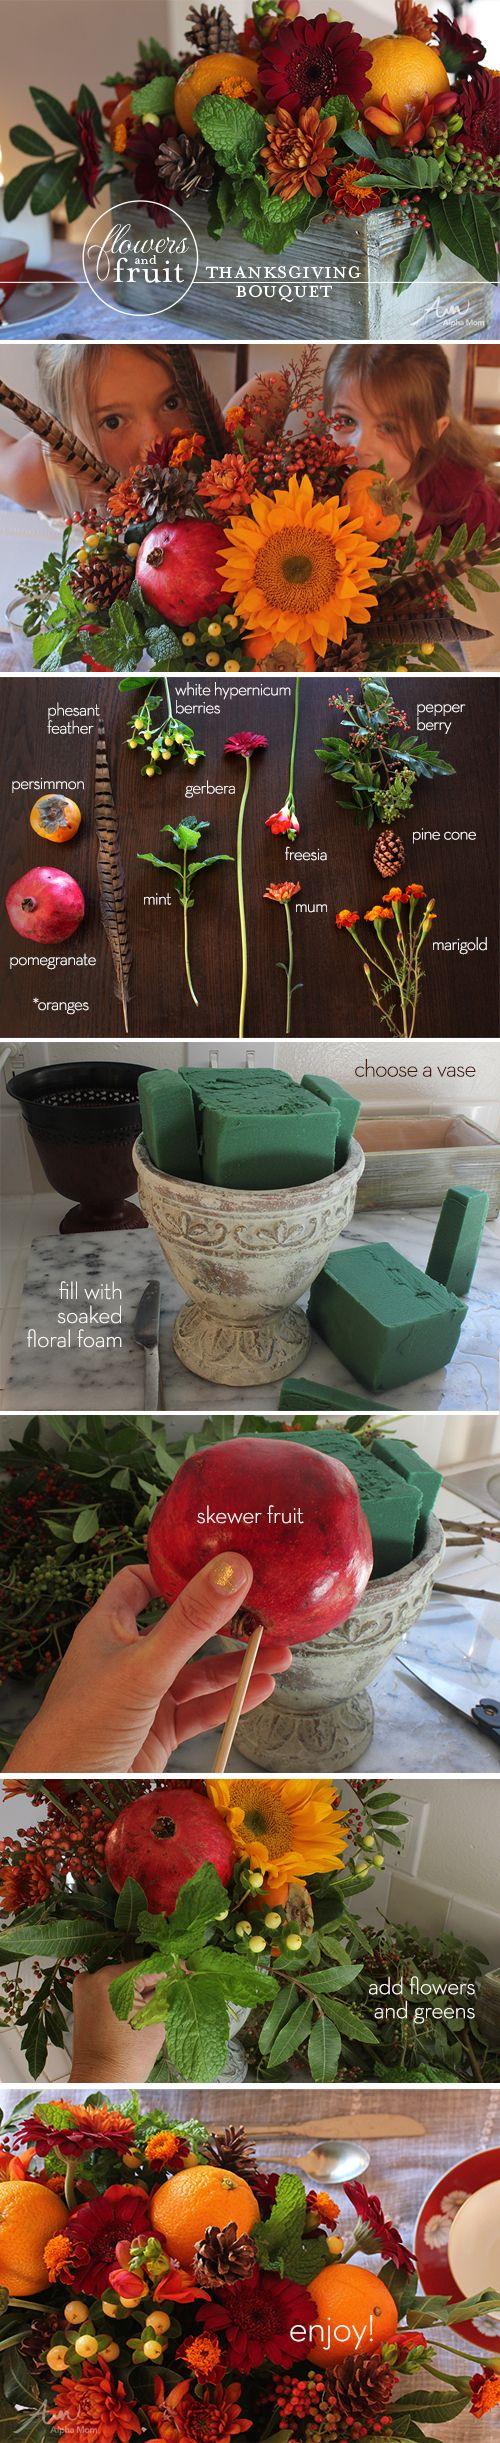 #Thanksgiving Flower Arrangement by Brenda Ponnay for Alphamom.com